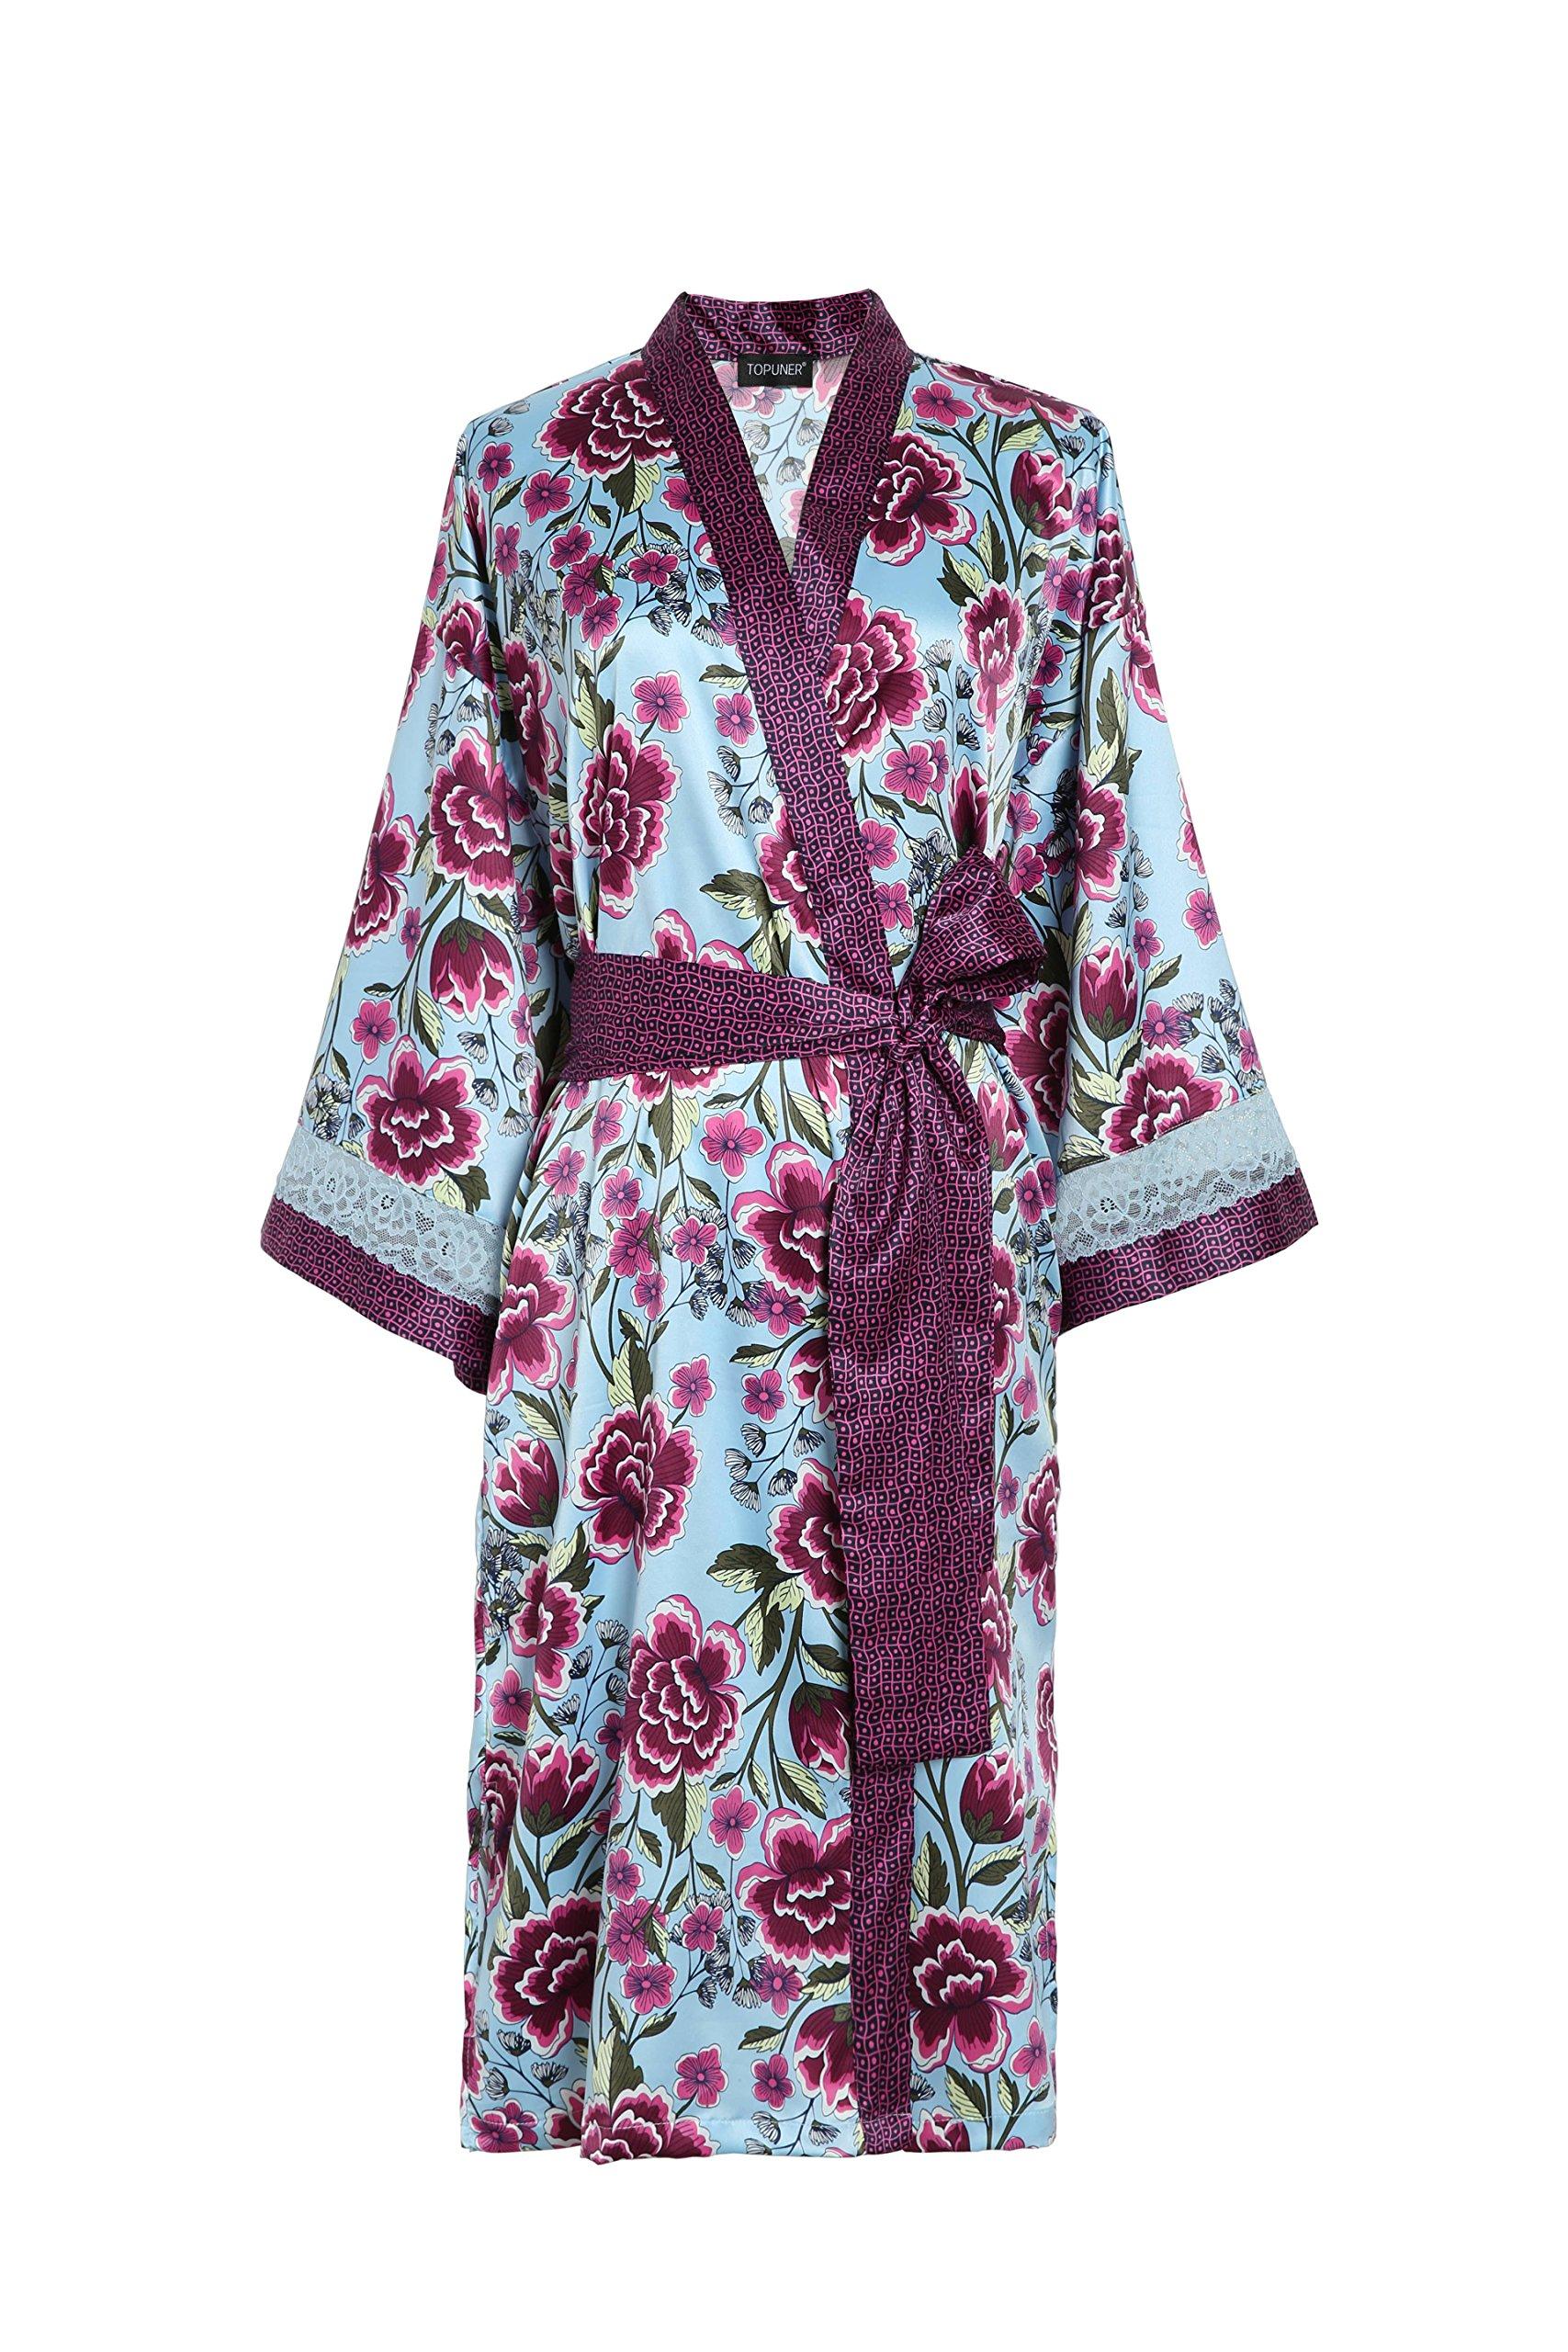 TOPUNER Womens' Summer Sleepwear Long Sleeves with Lace, Floral Print Silk Robe Kimono Bathrobe with Belt (L/XL)